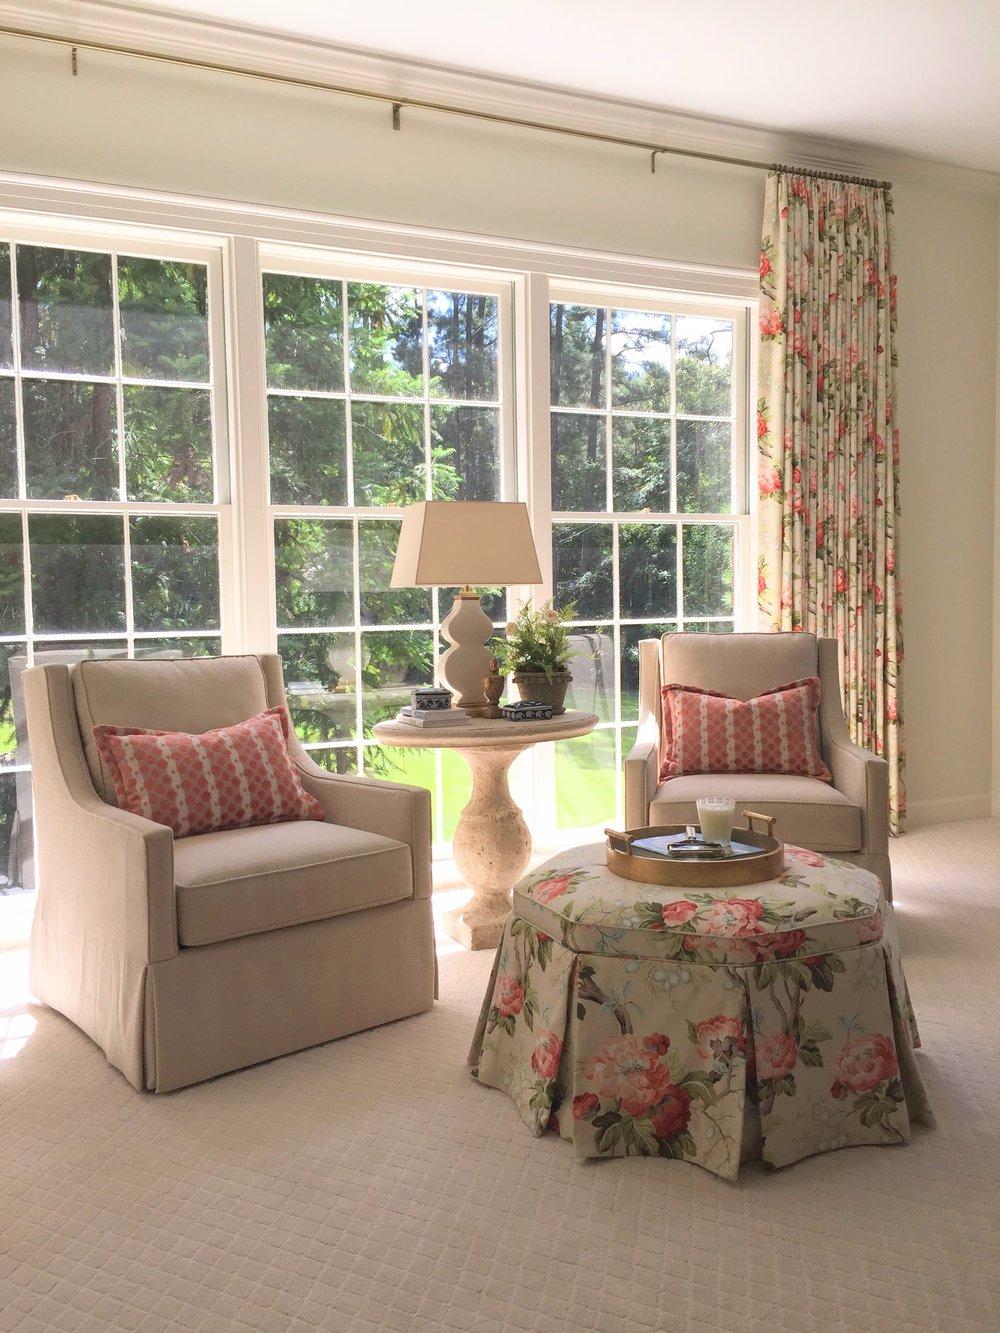 Master Bedroom Sitting Area - After